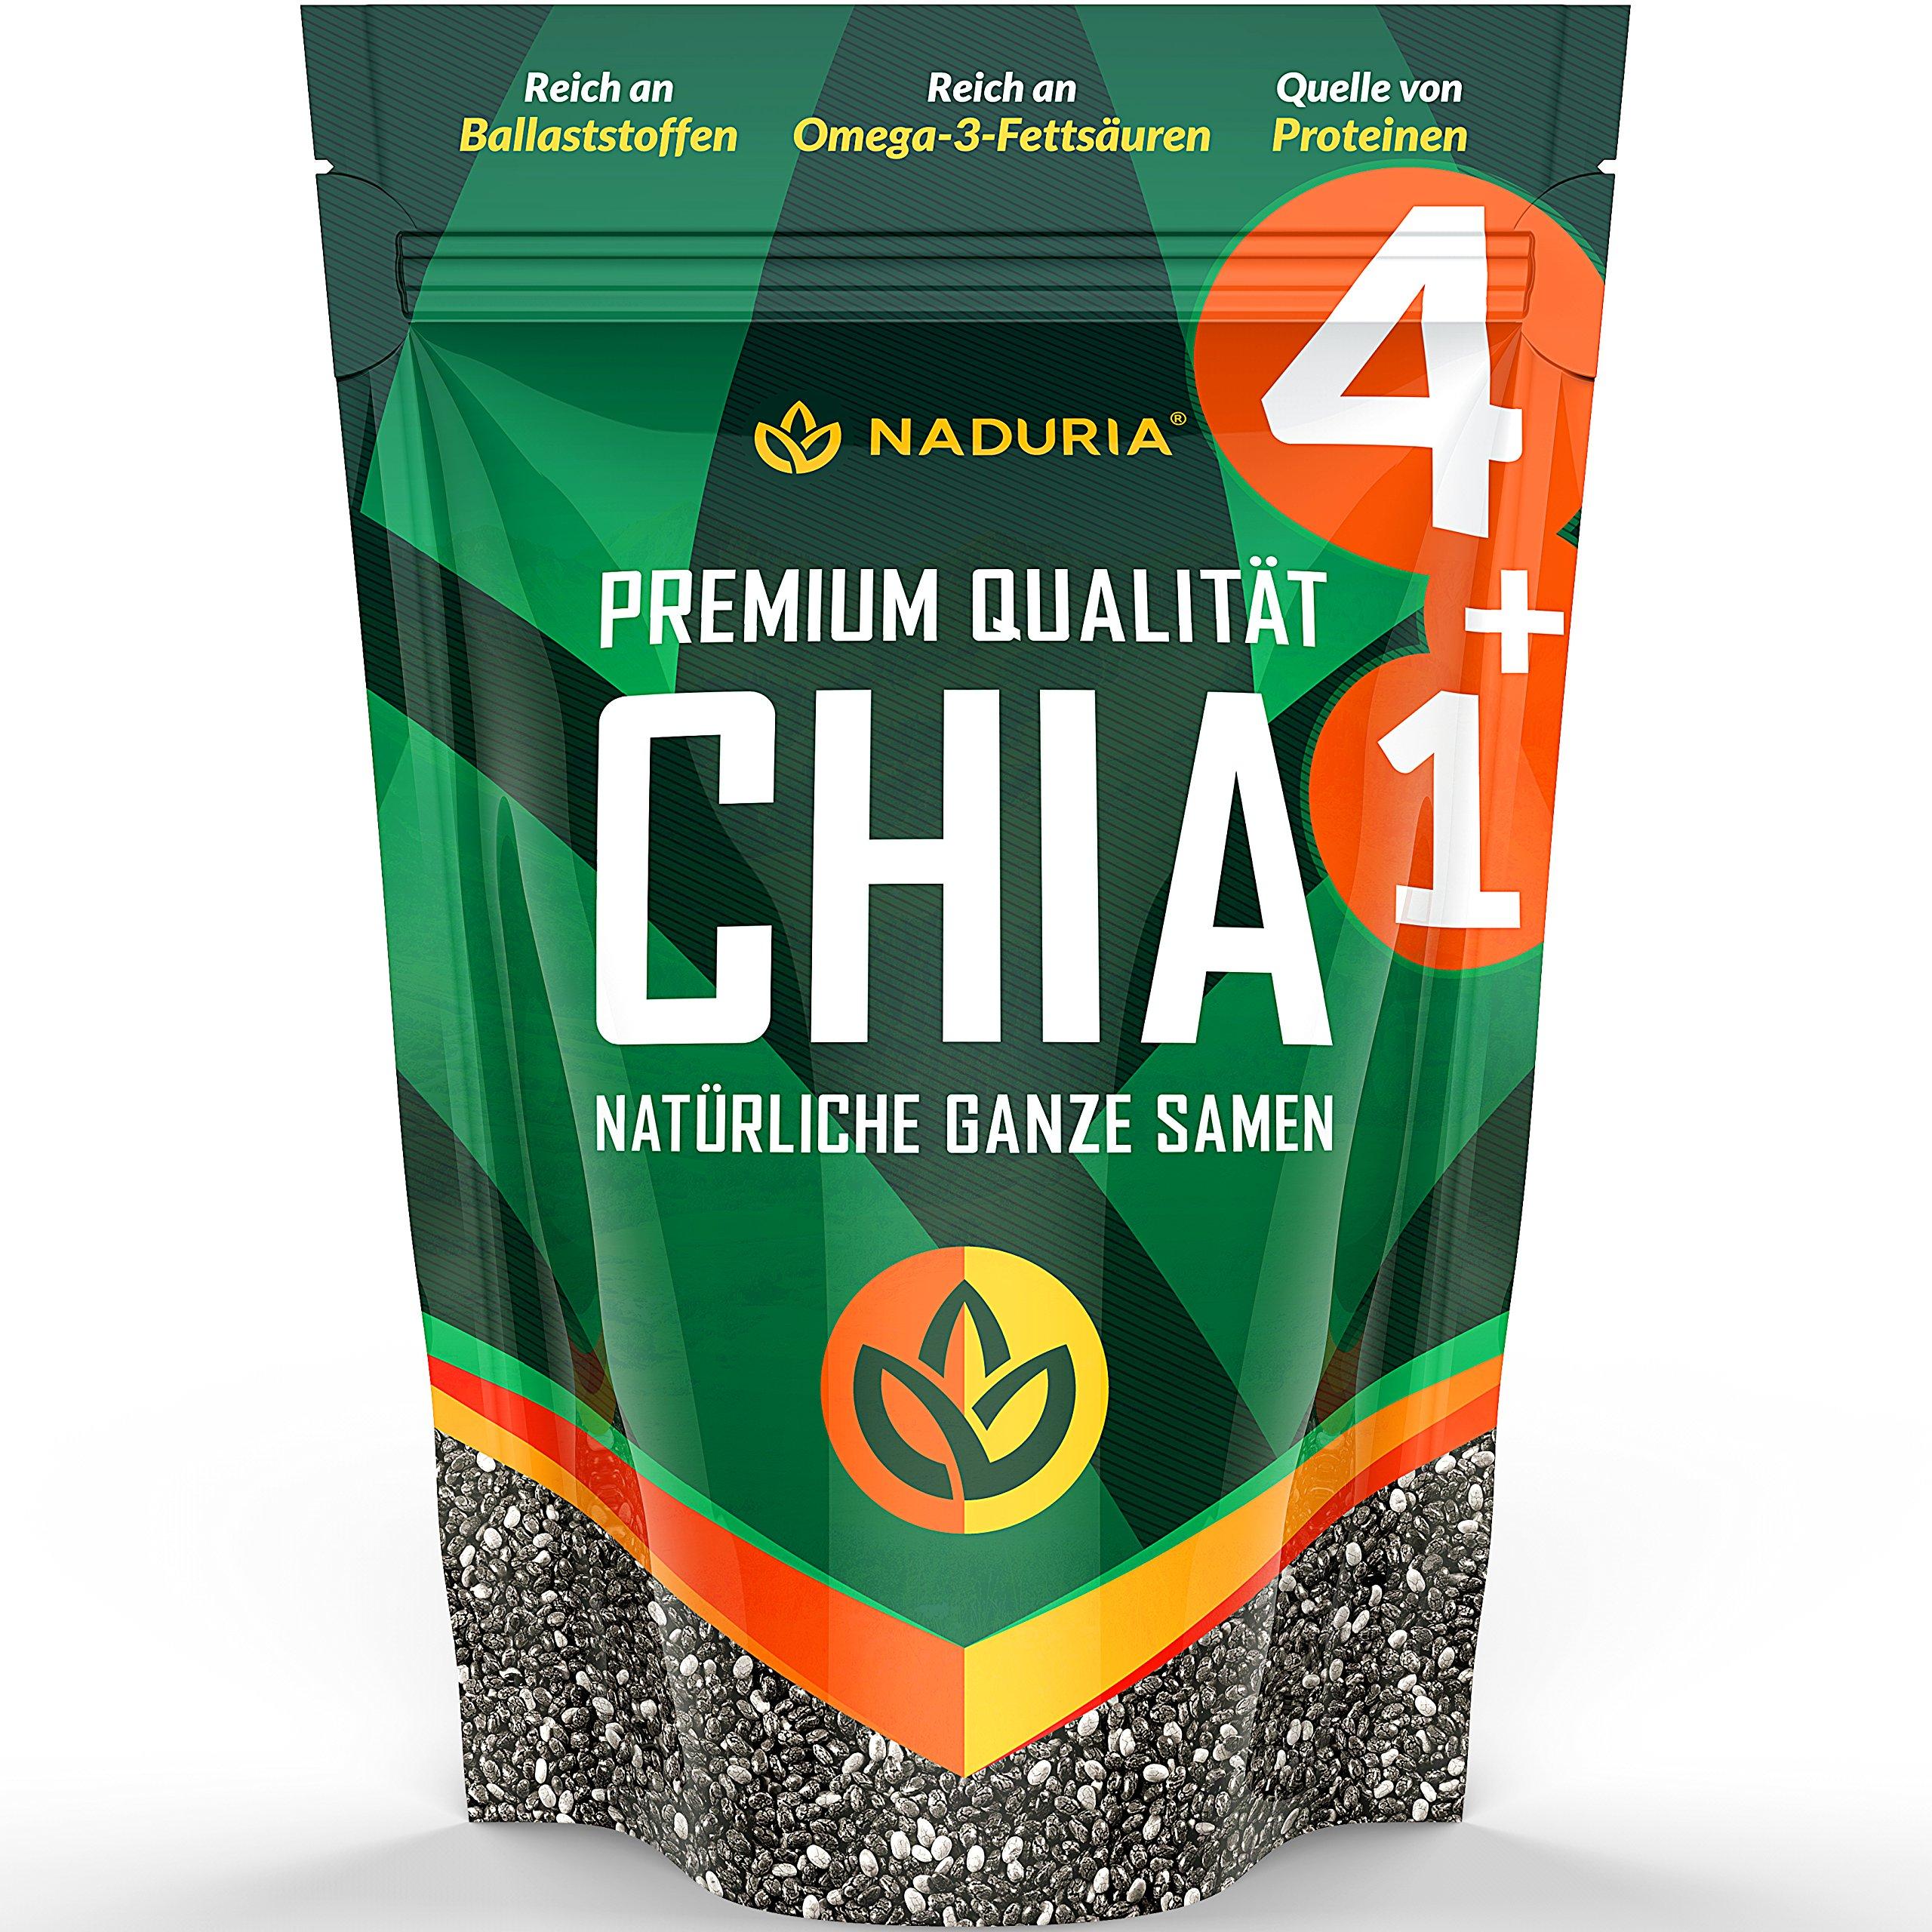 Naduria Premium ganze schwarze Chia Samen 5 x 500 Gramm product image